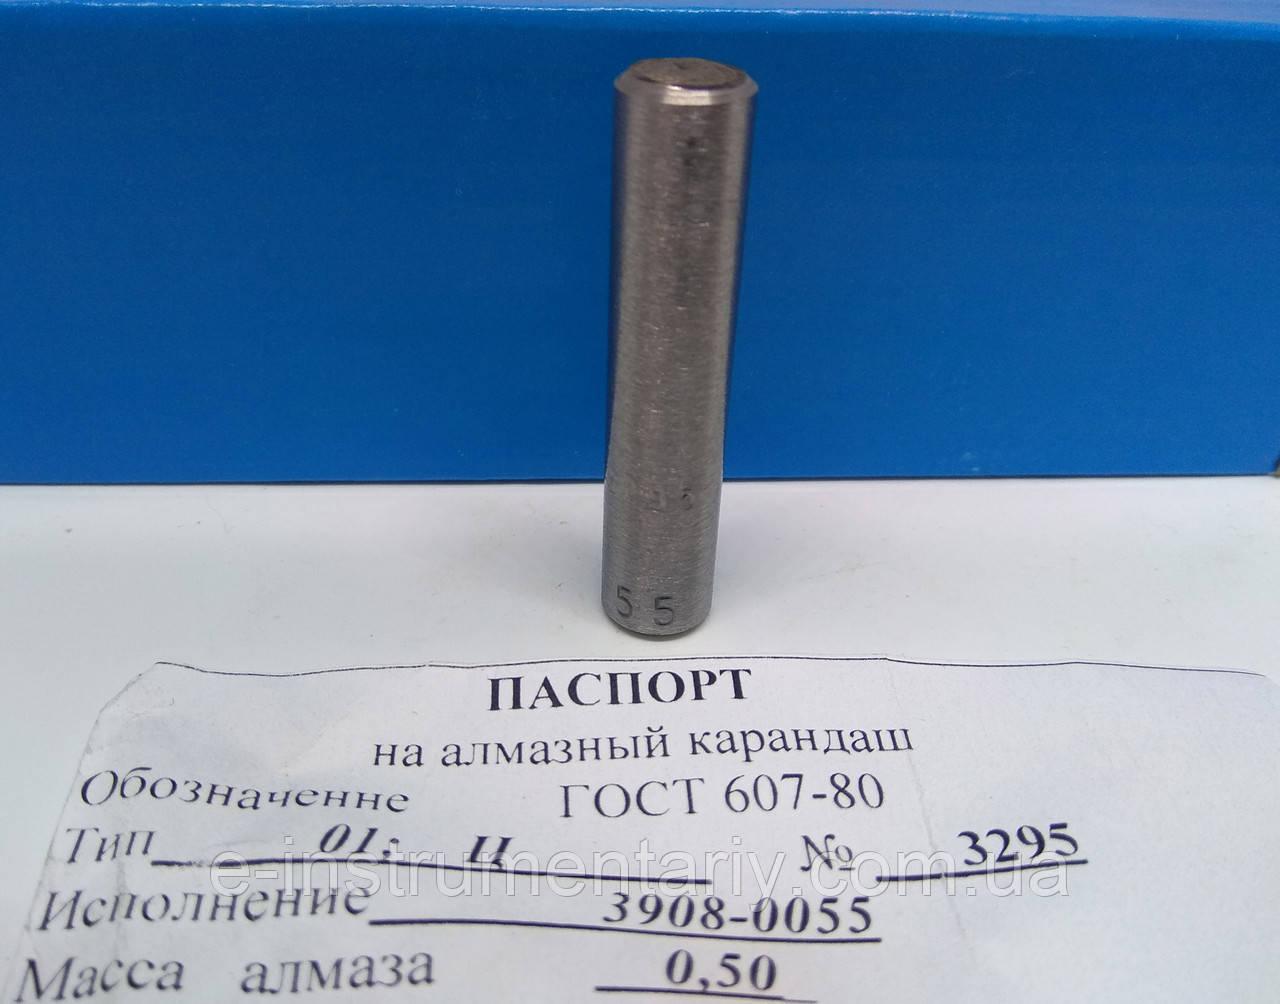 Карандаш алмазный 3908-0055/1 тип 01 исп.А 0,31-0,5 карат. качество- 1